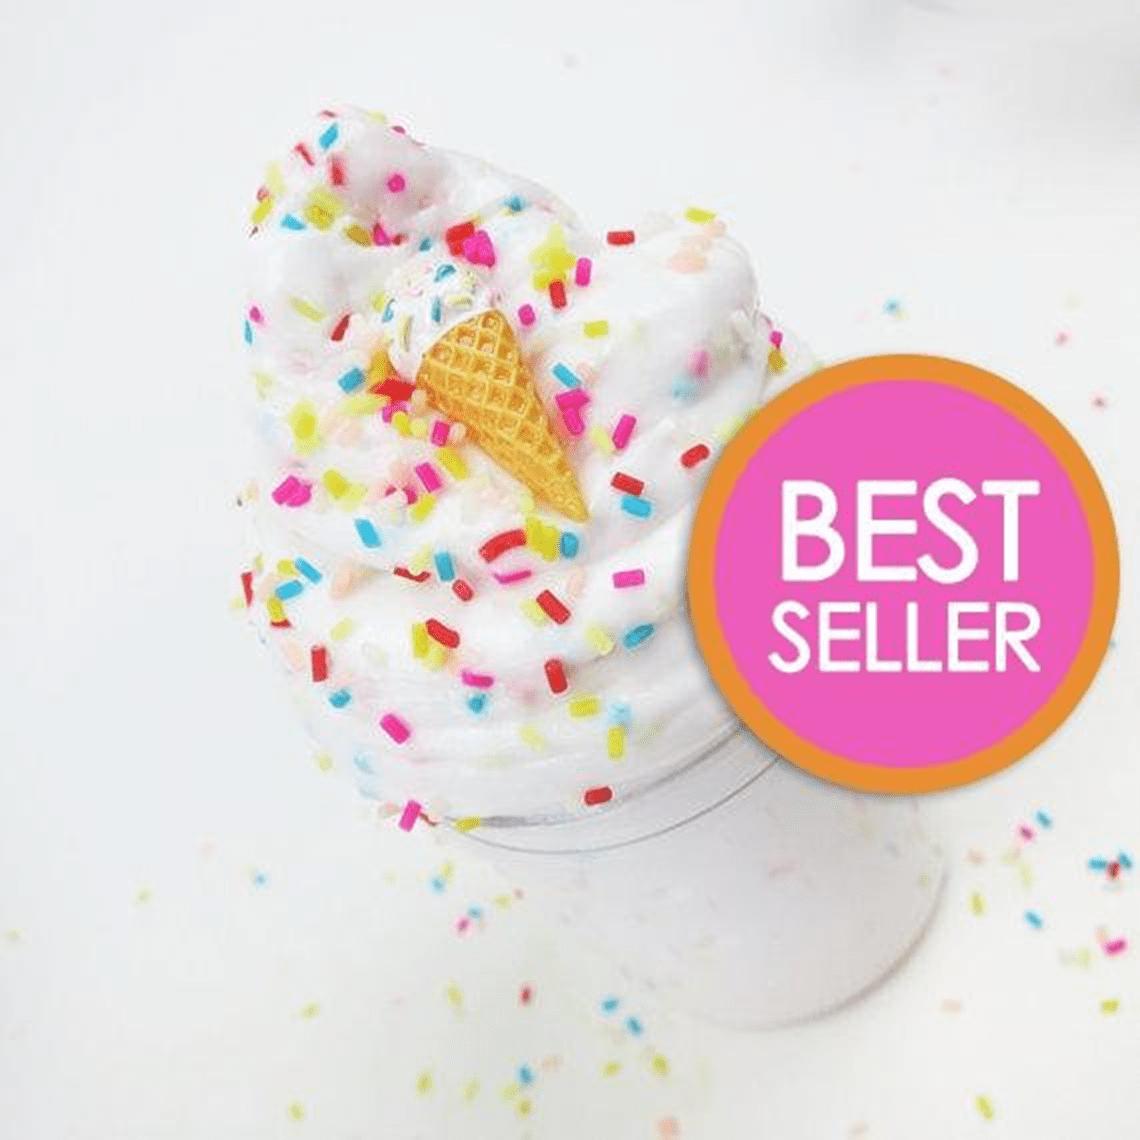 Ice Cream Birthday Cake With Sprinkles & Charm